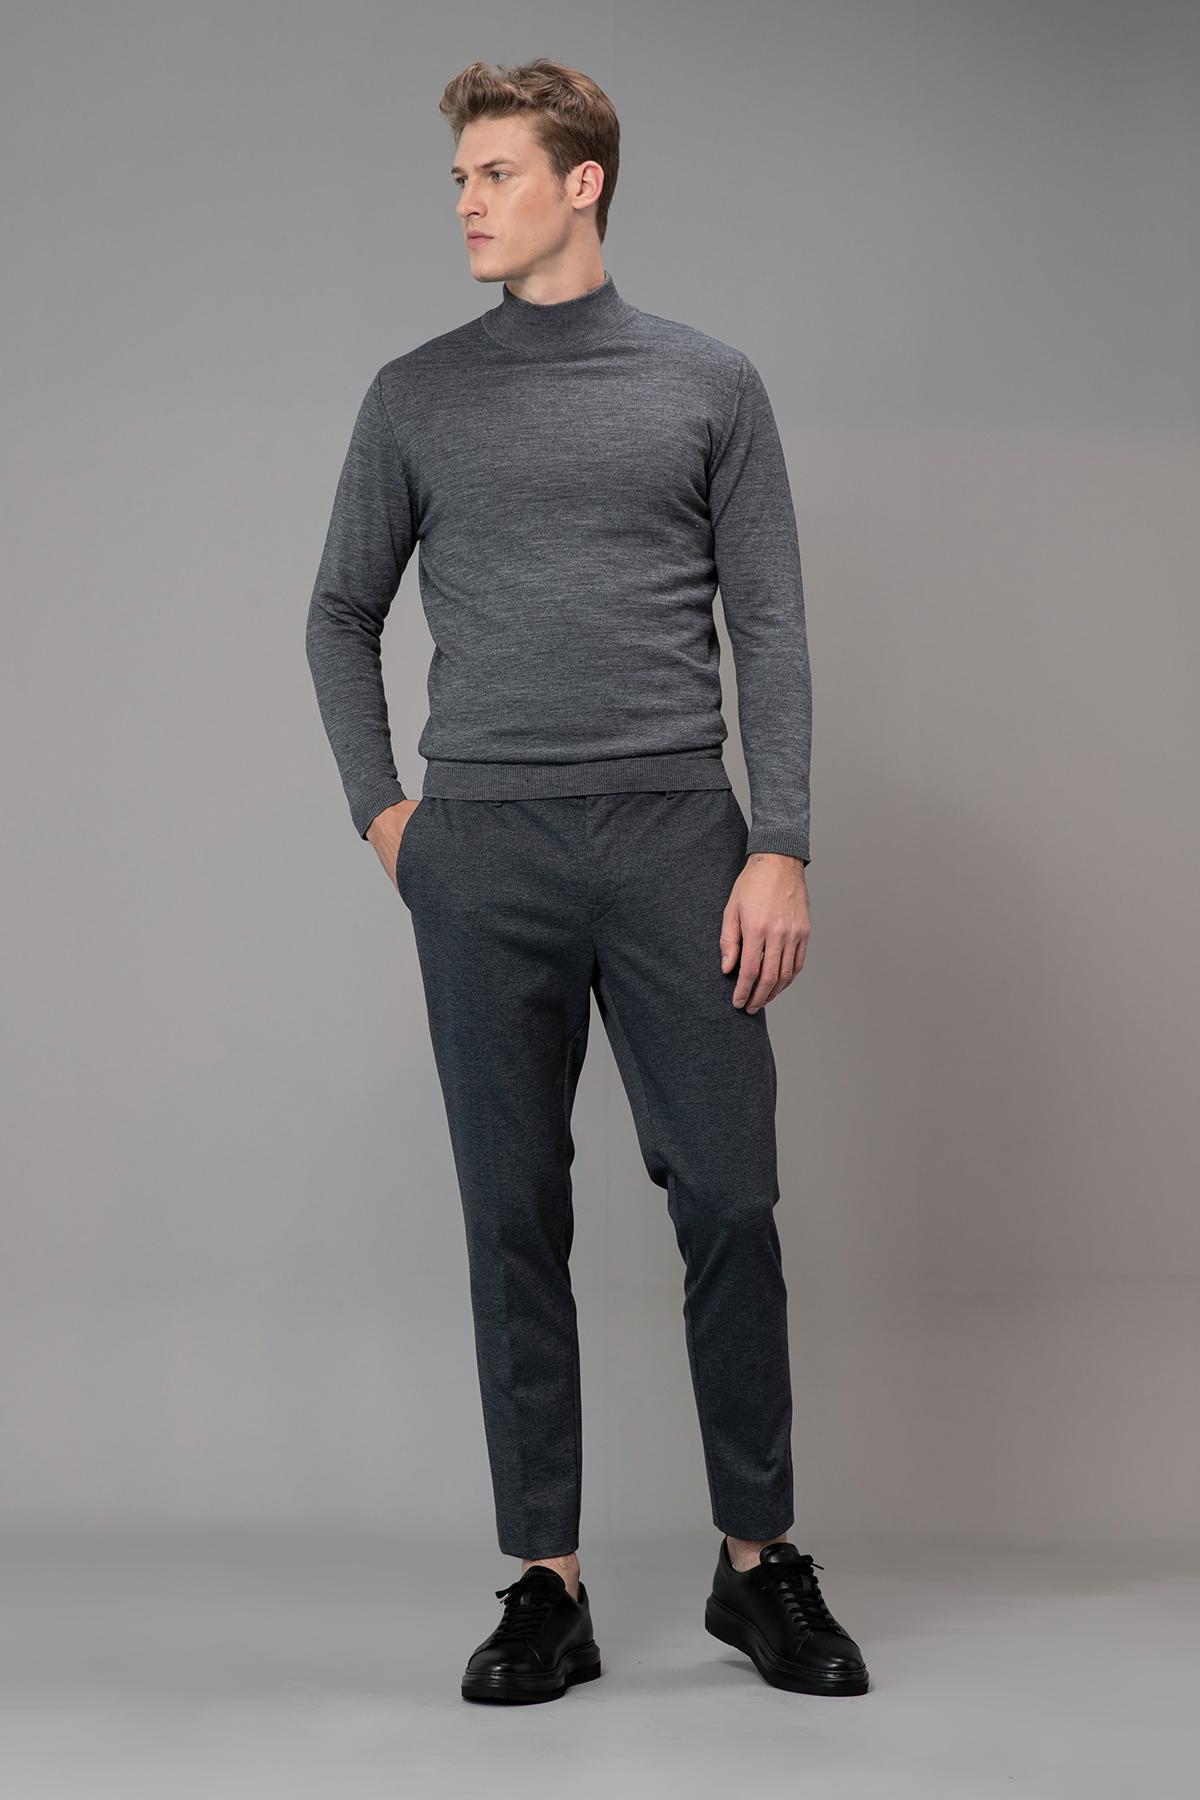 Okmar Smart Chino Pantolon Slim Fit Gri